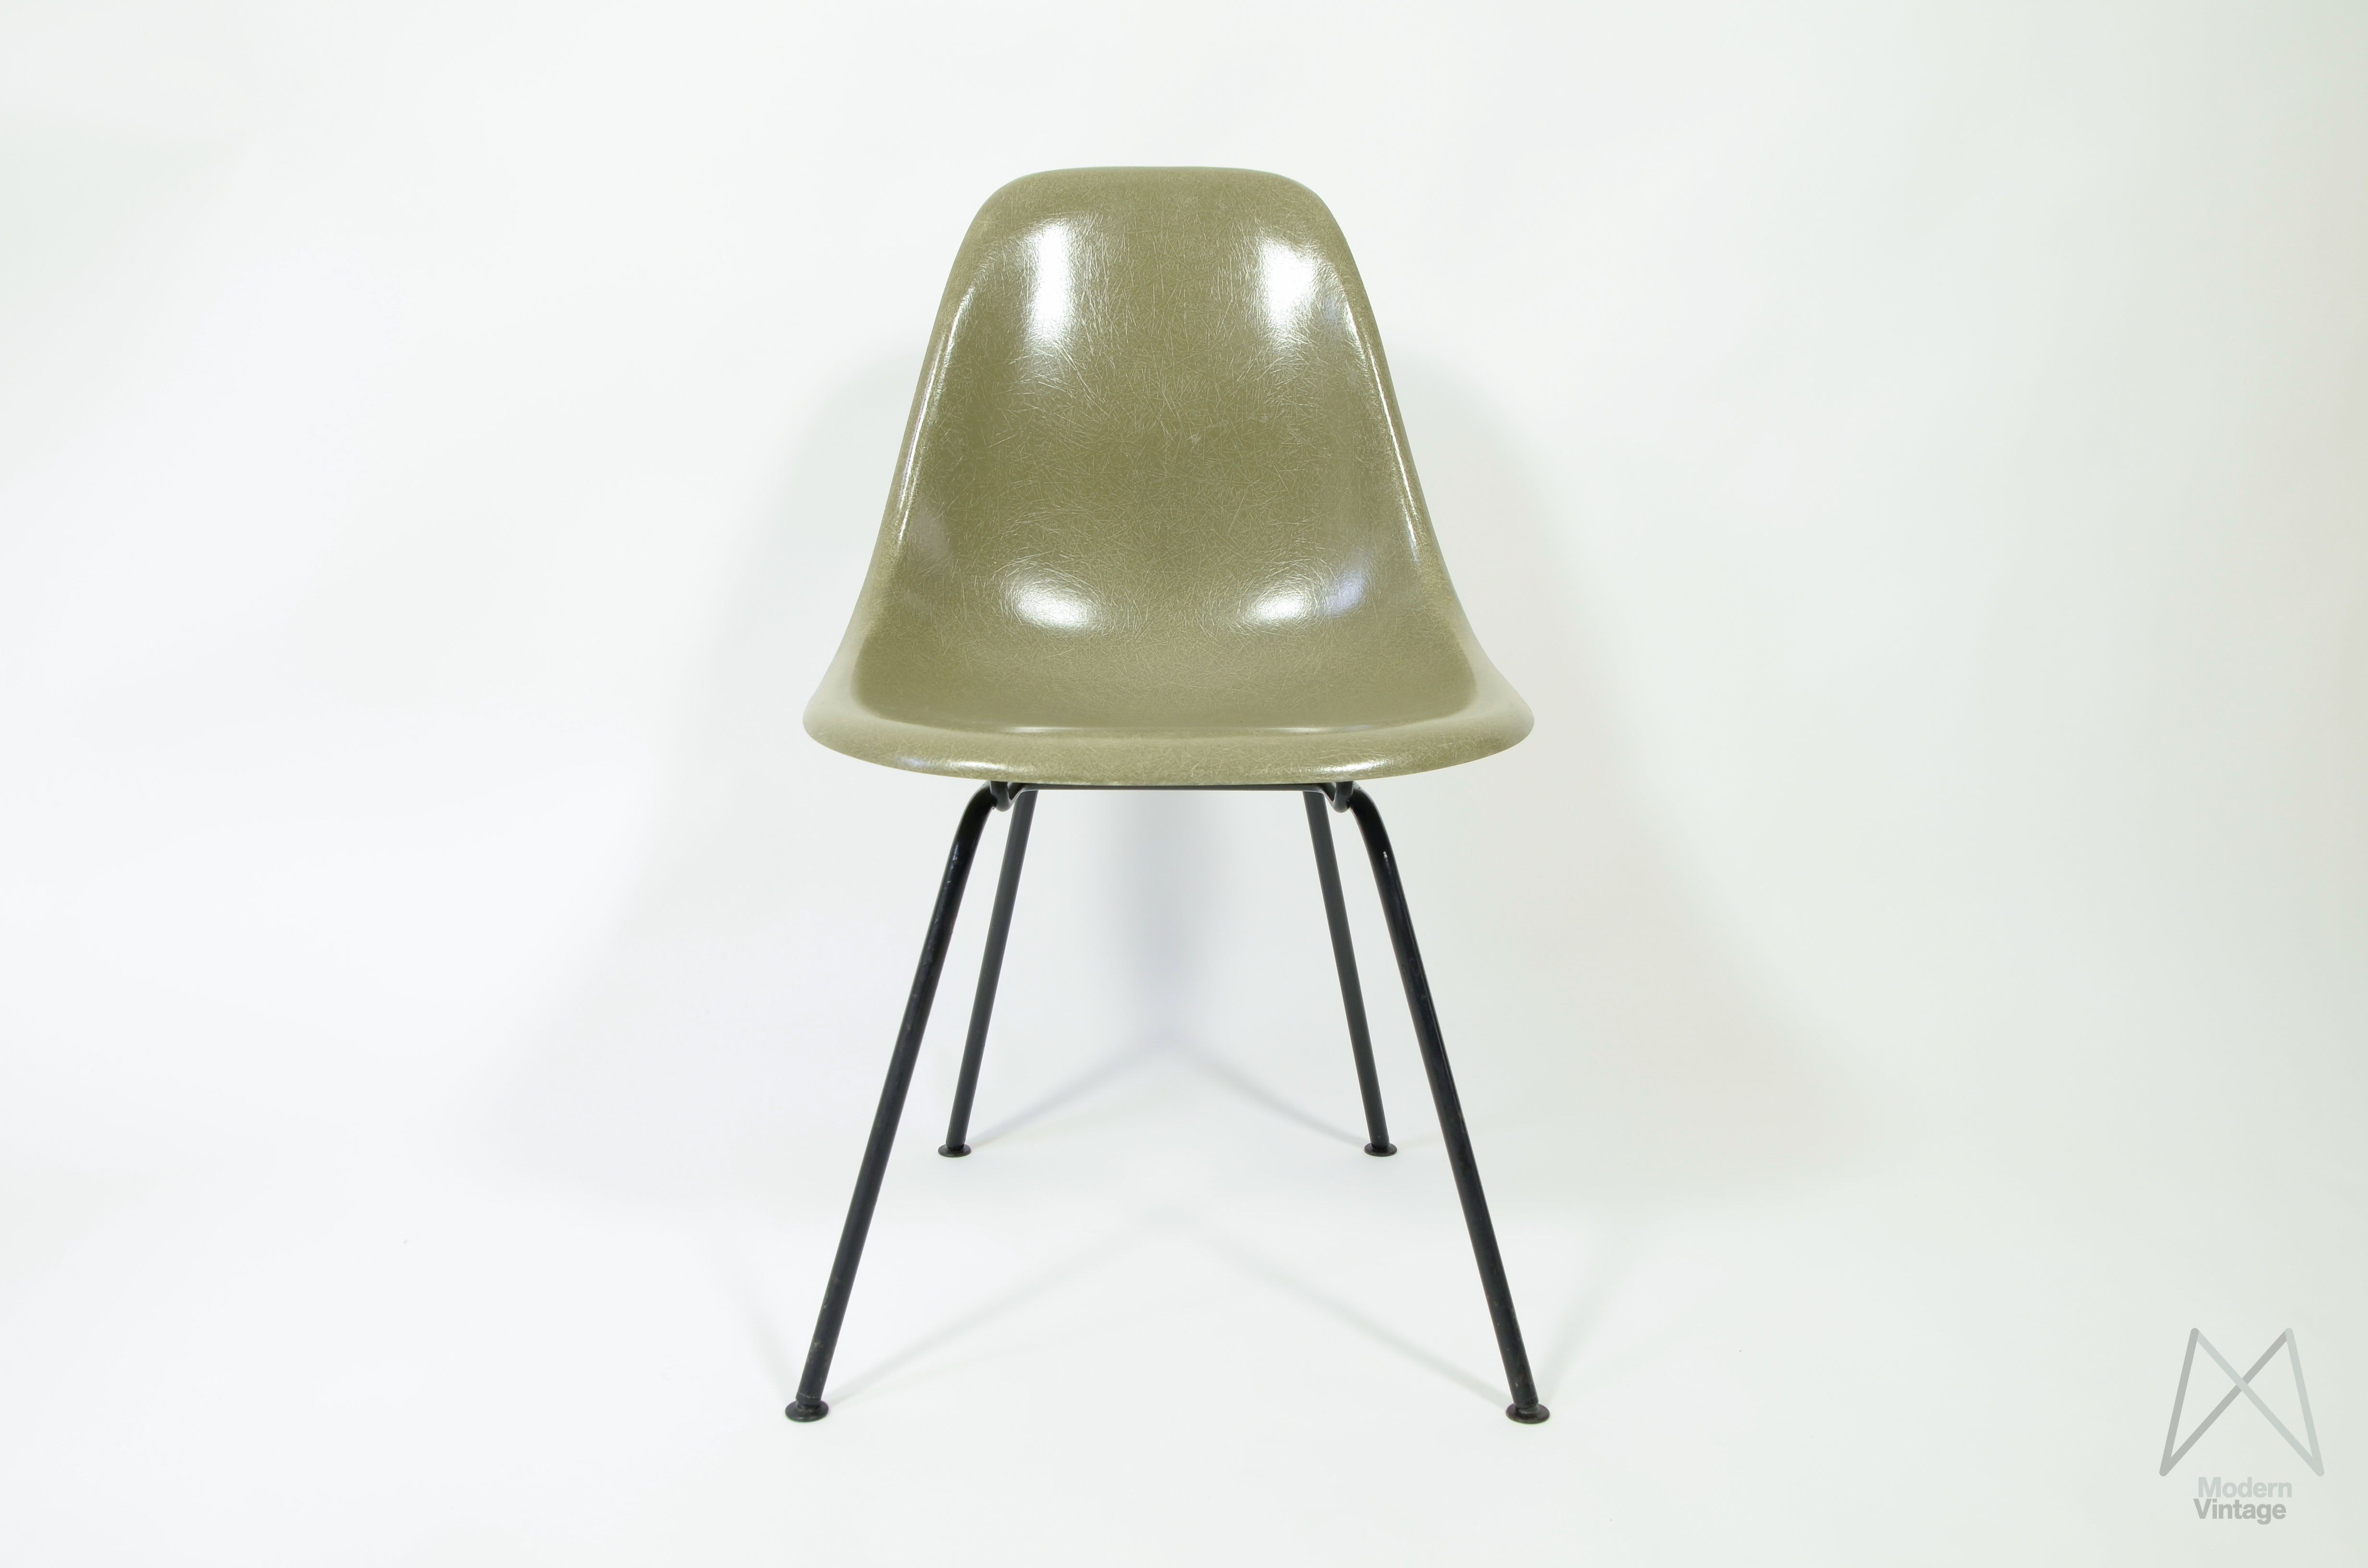 eames fiberglass chair cheap bubble modern vintage amsterdam original furniture